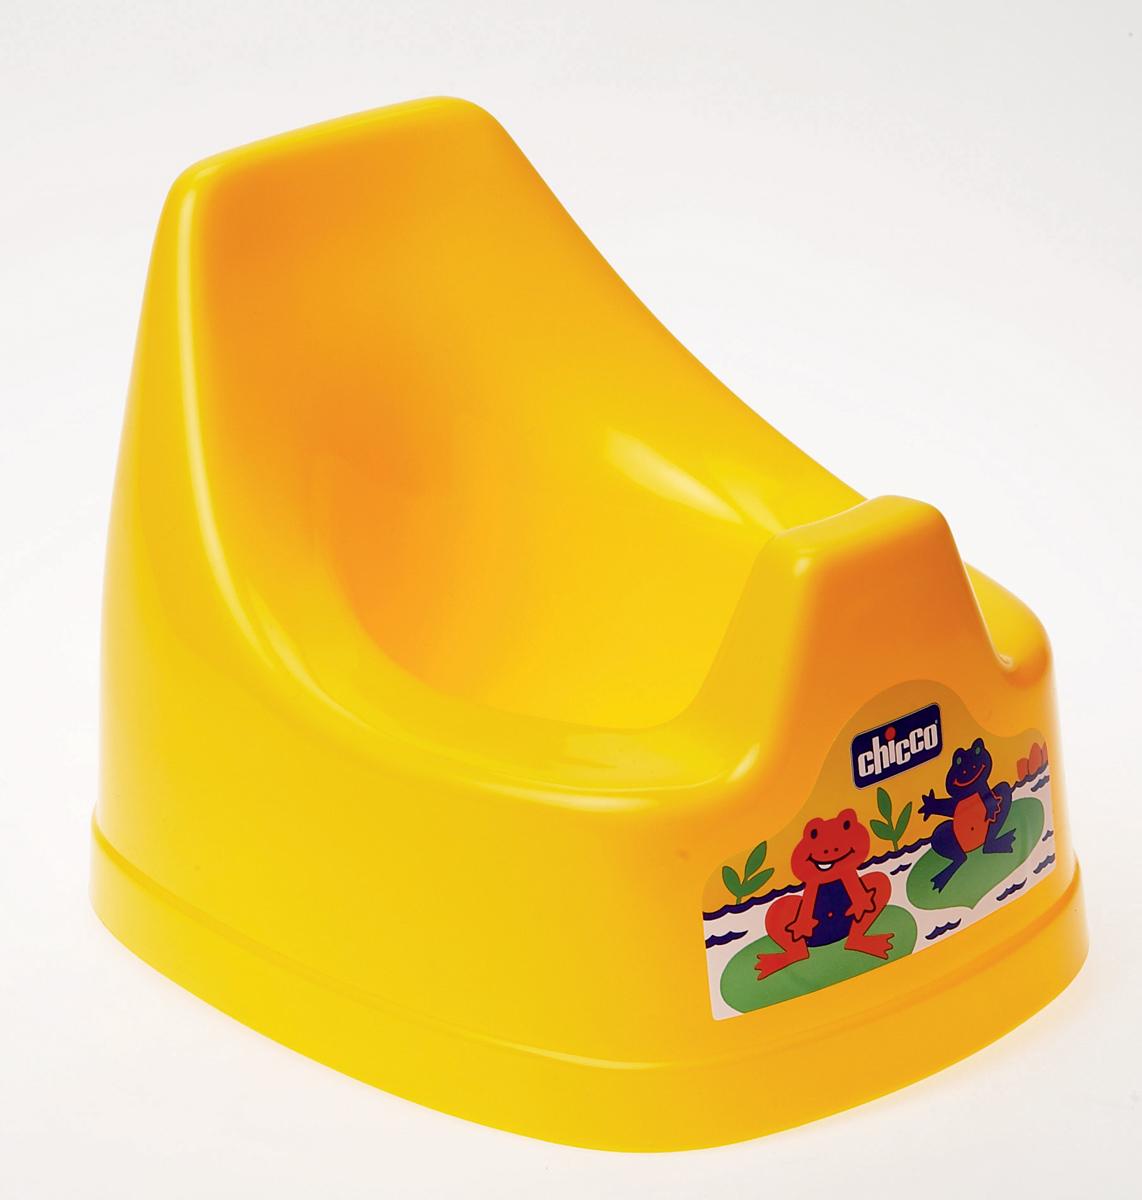 Empty pot - simple item